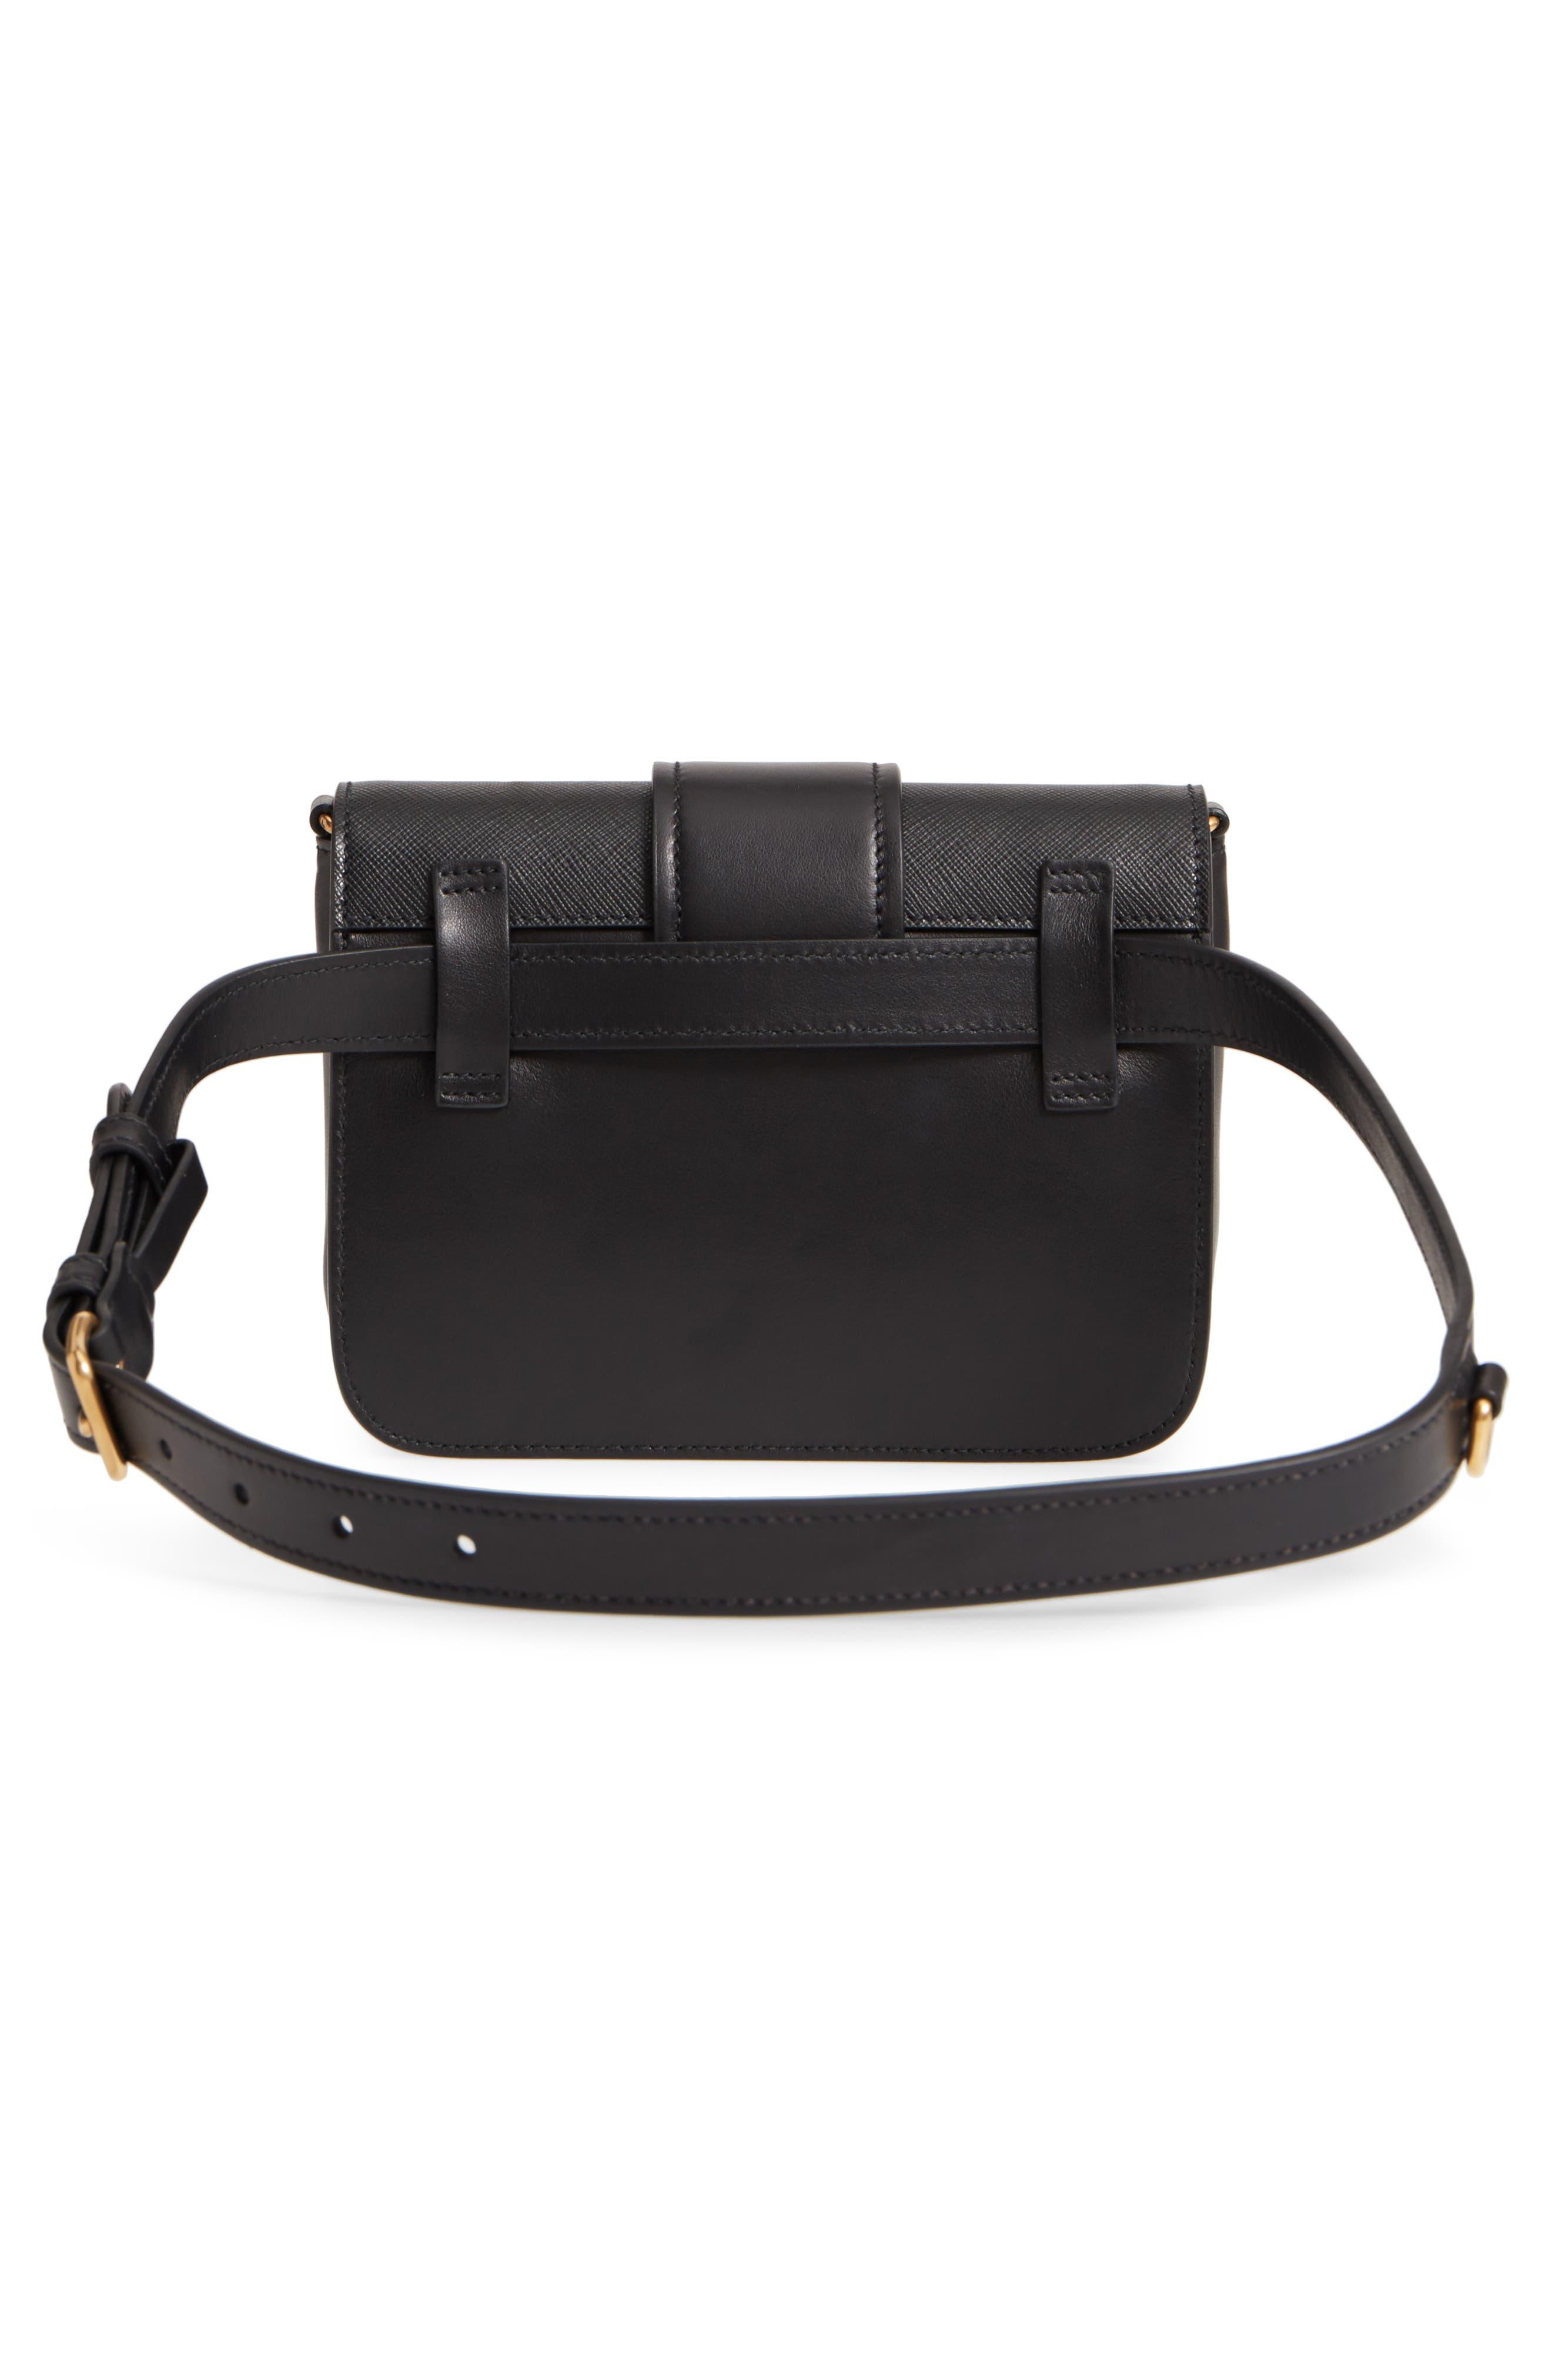 PRADA,                             Cahier Leather Belt Bag,                             Alternate thumbnail 4, color,                             001